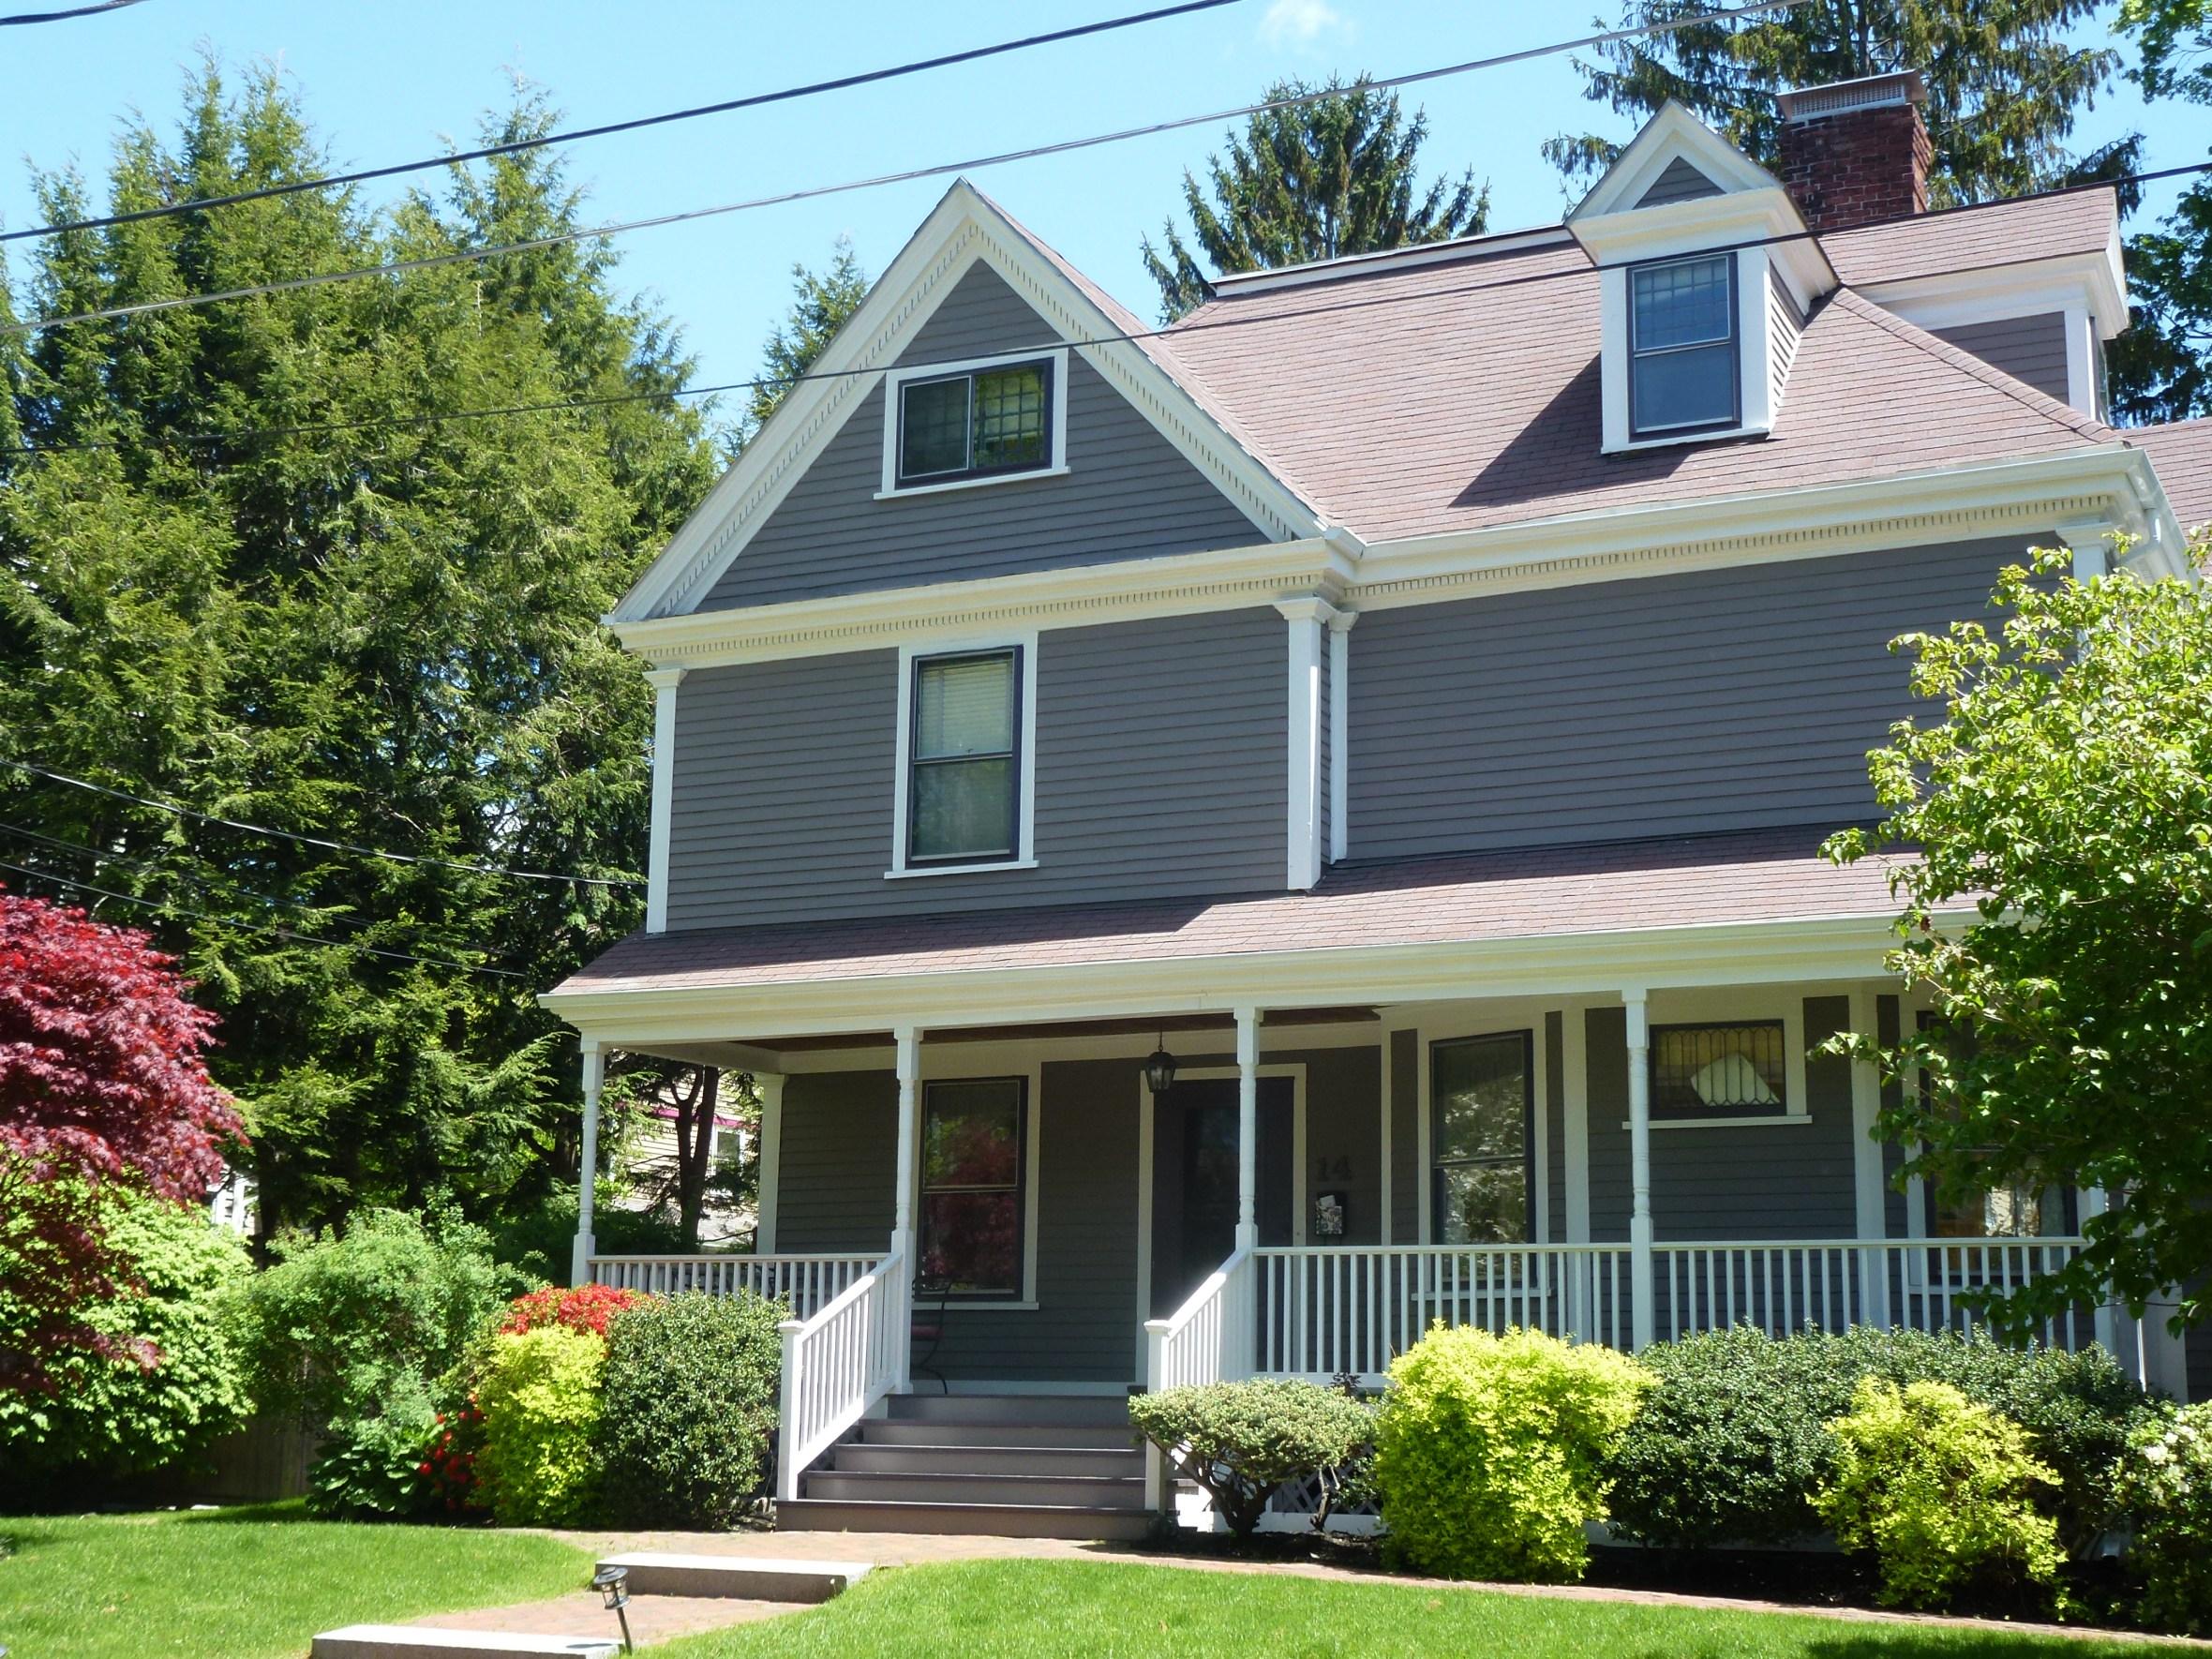 Color design - Victorian exterior - warm taupe a classic design